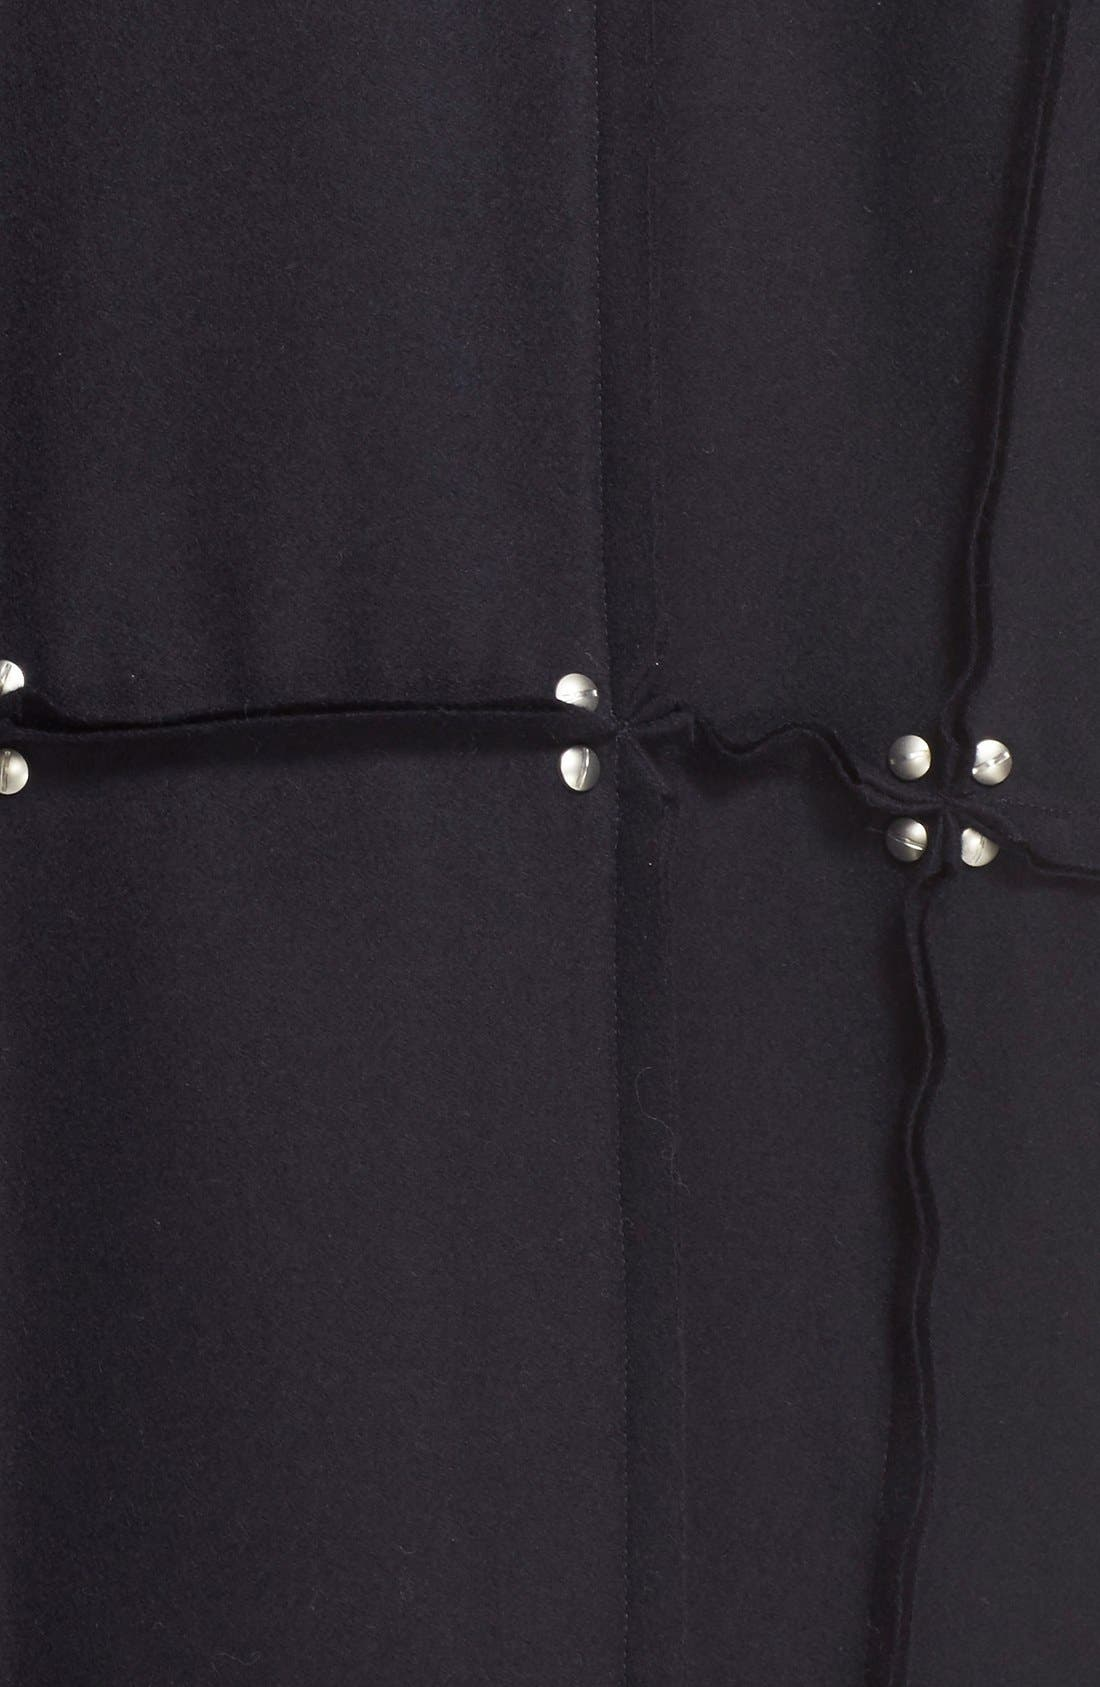 Rivet Detail Paneled Wool Coat,                             Alternate thumbnail 2, color,                             410